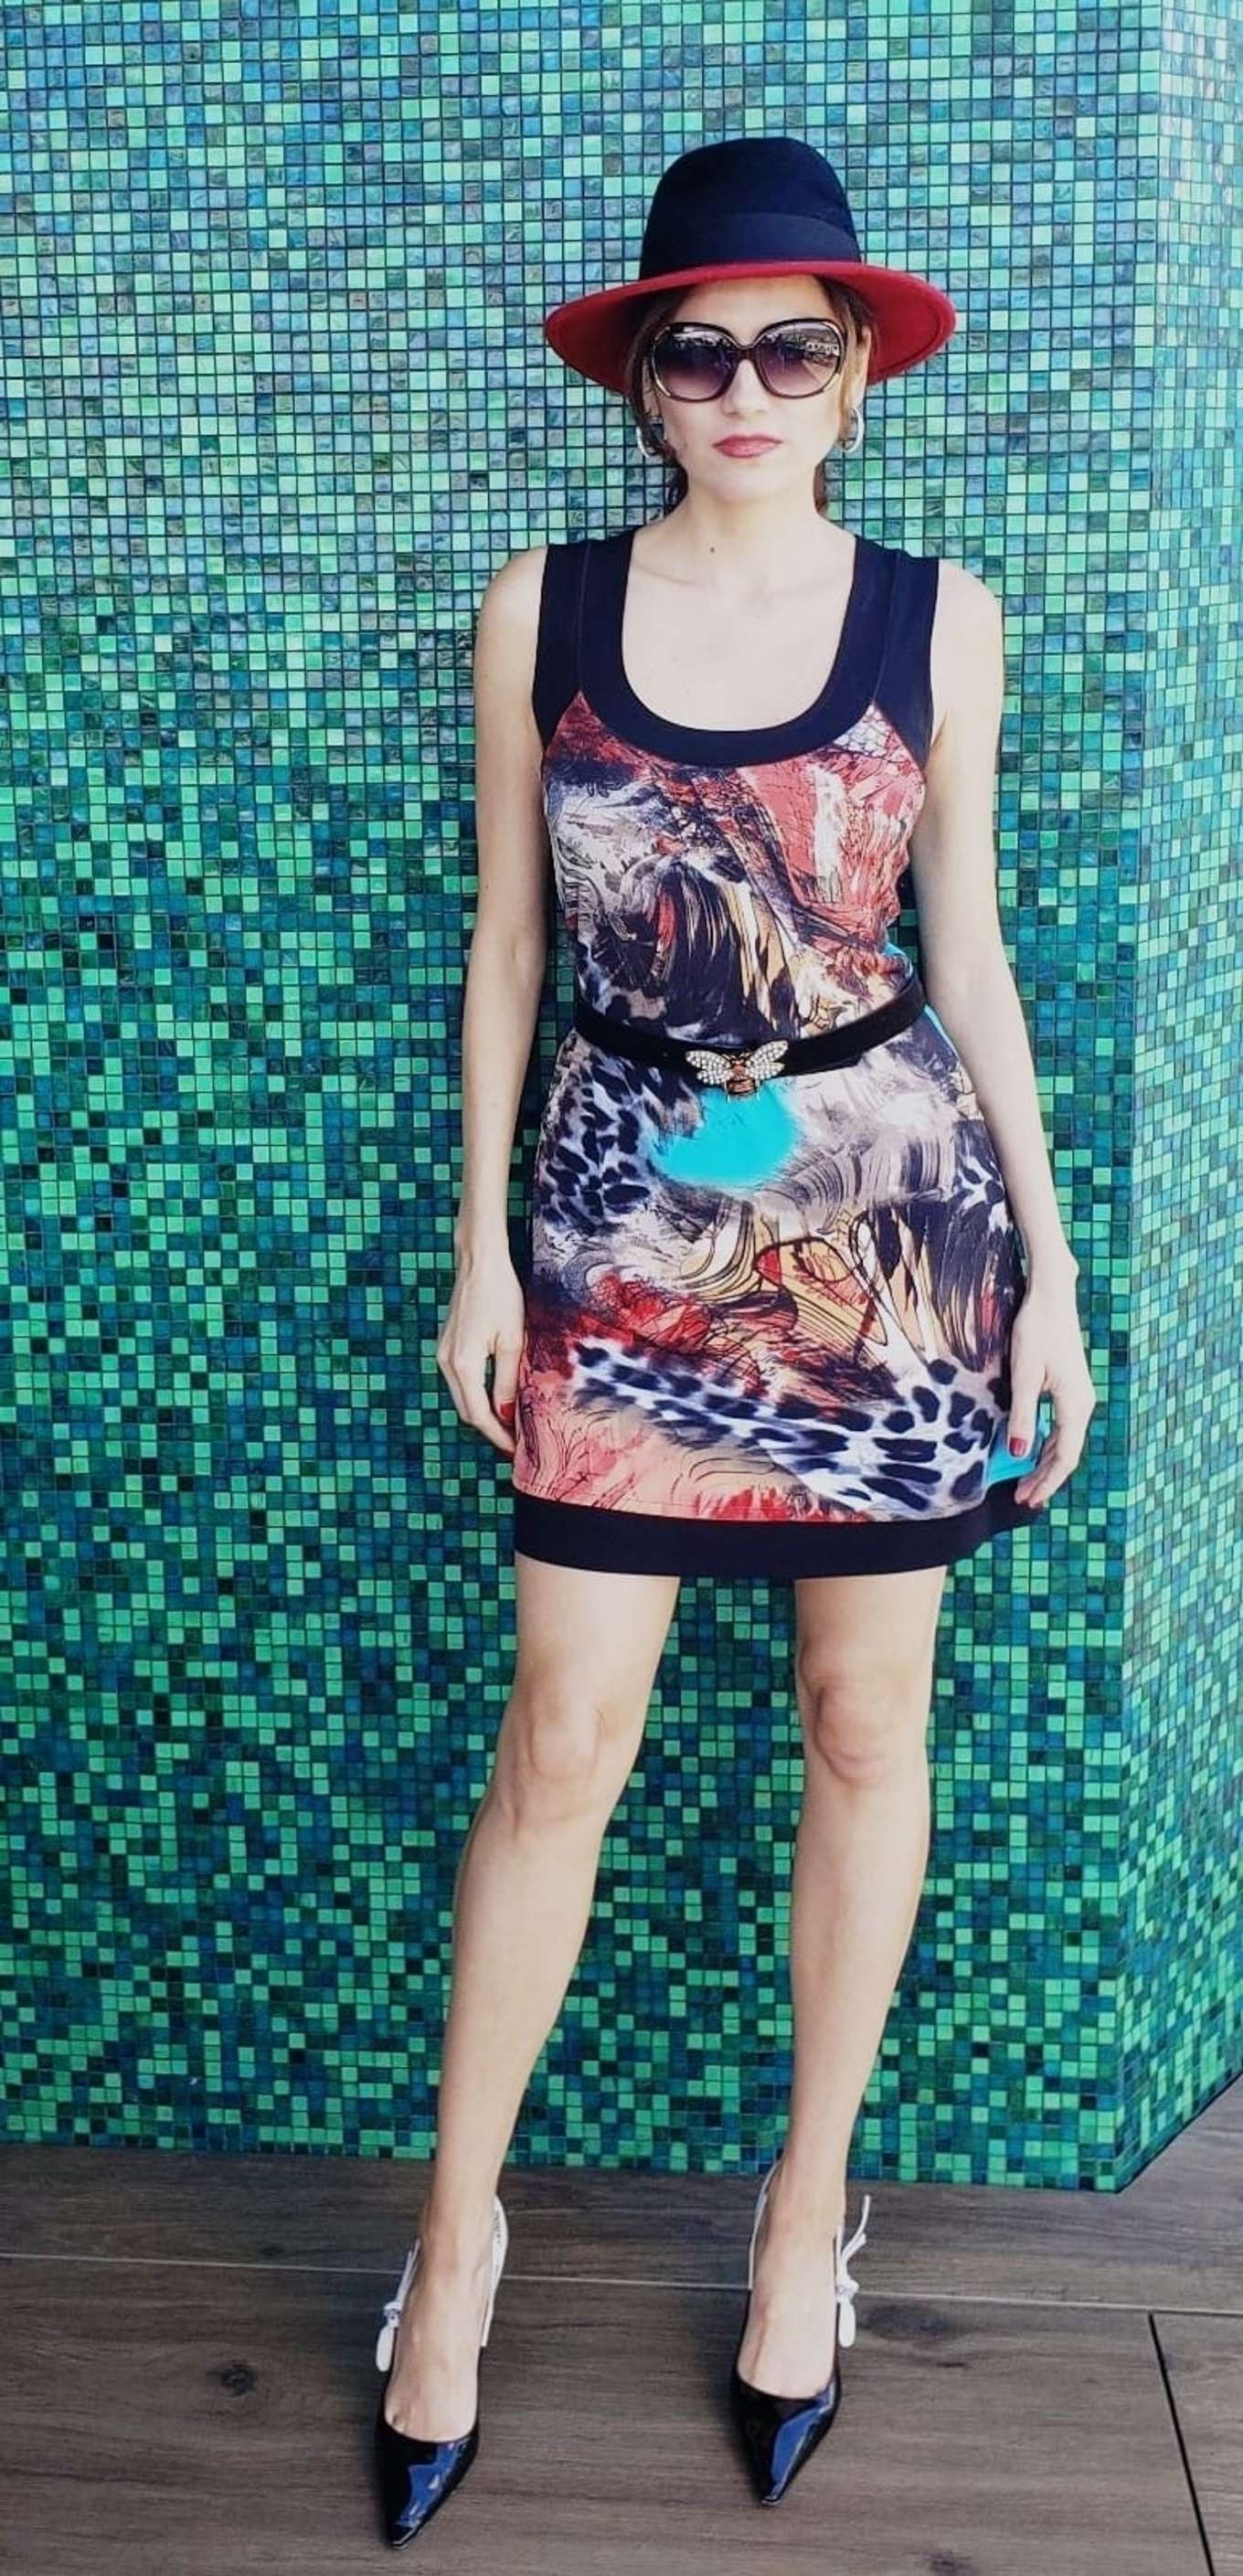 Blanca Blanco 2019 : Blanca Blanco – Posing on a sunny day in Beverly Hills-01